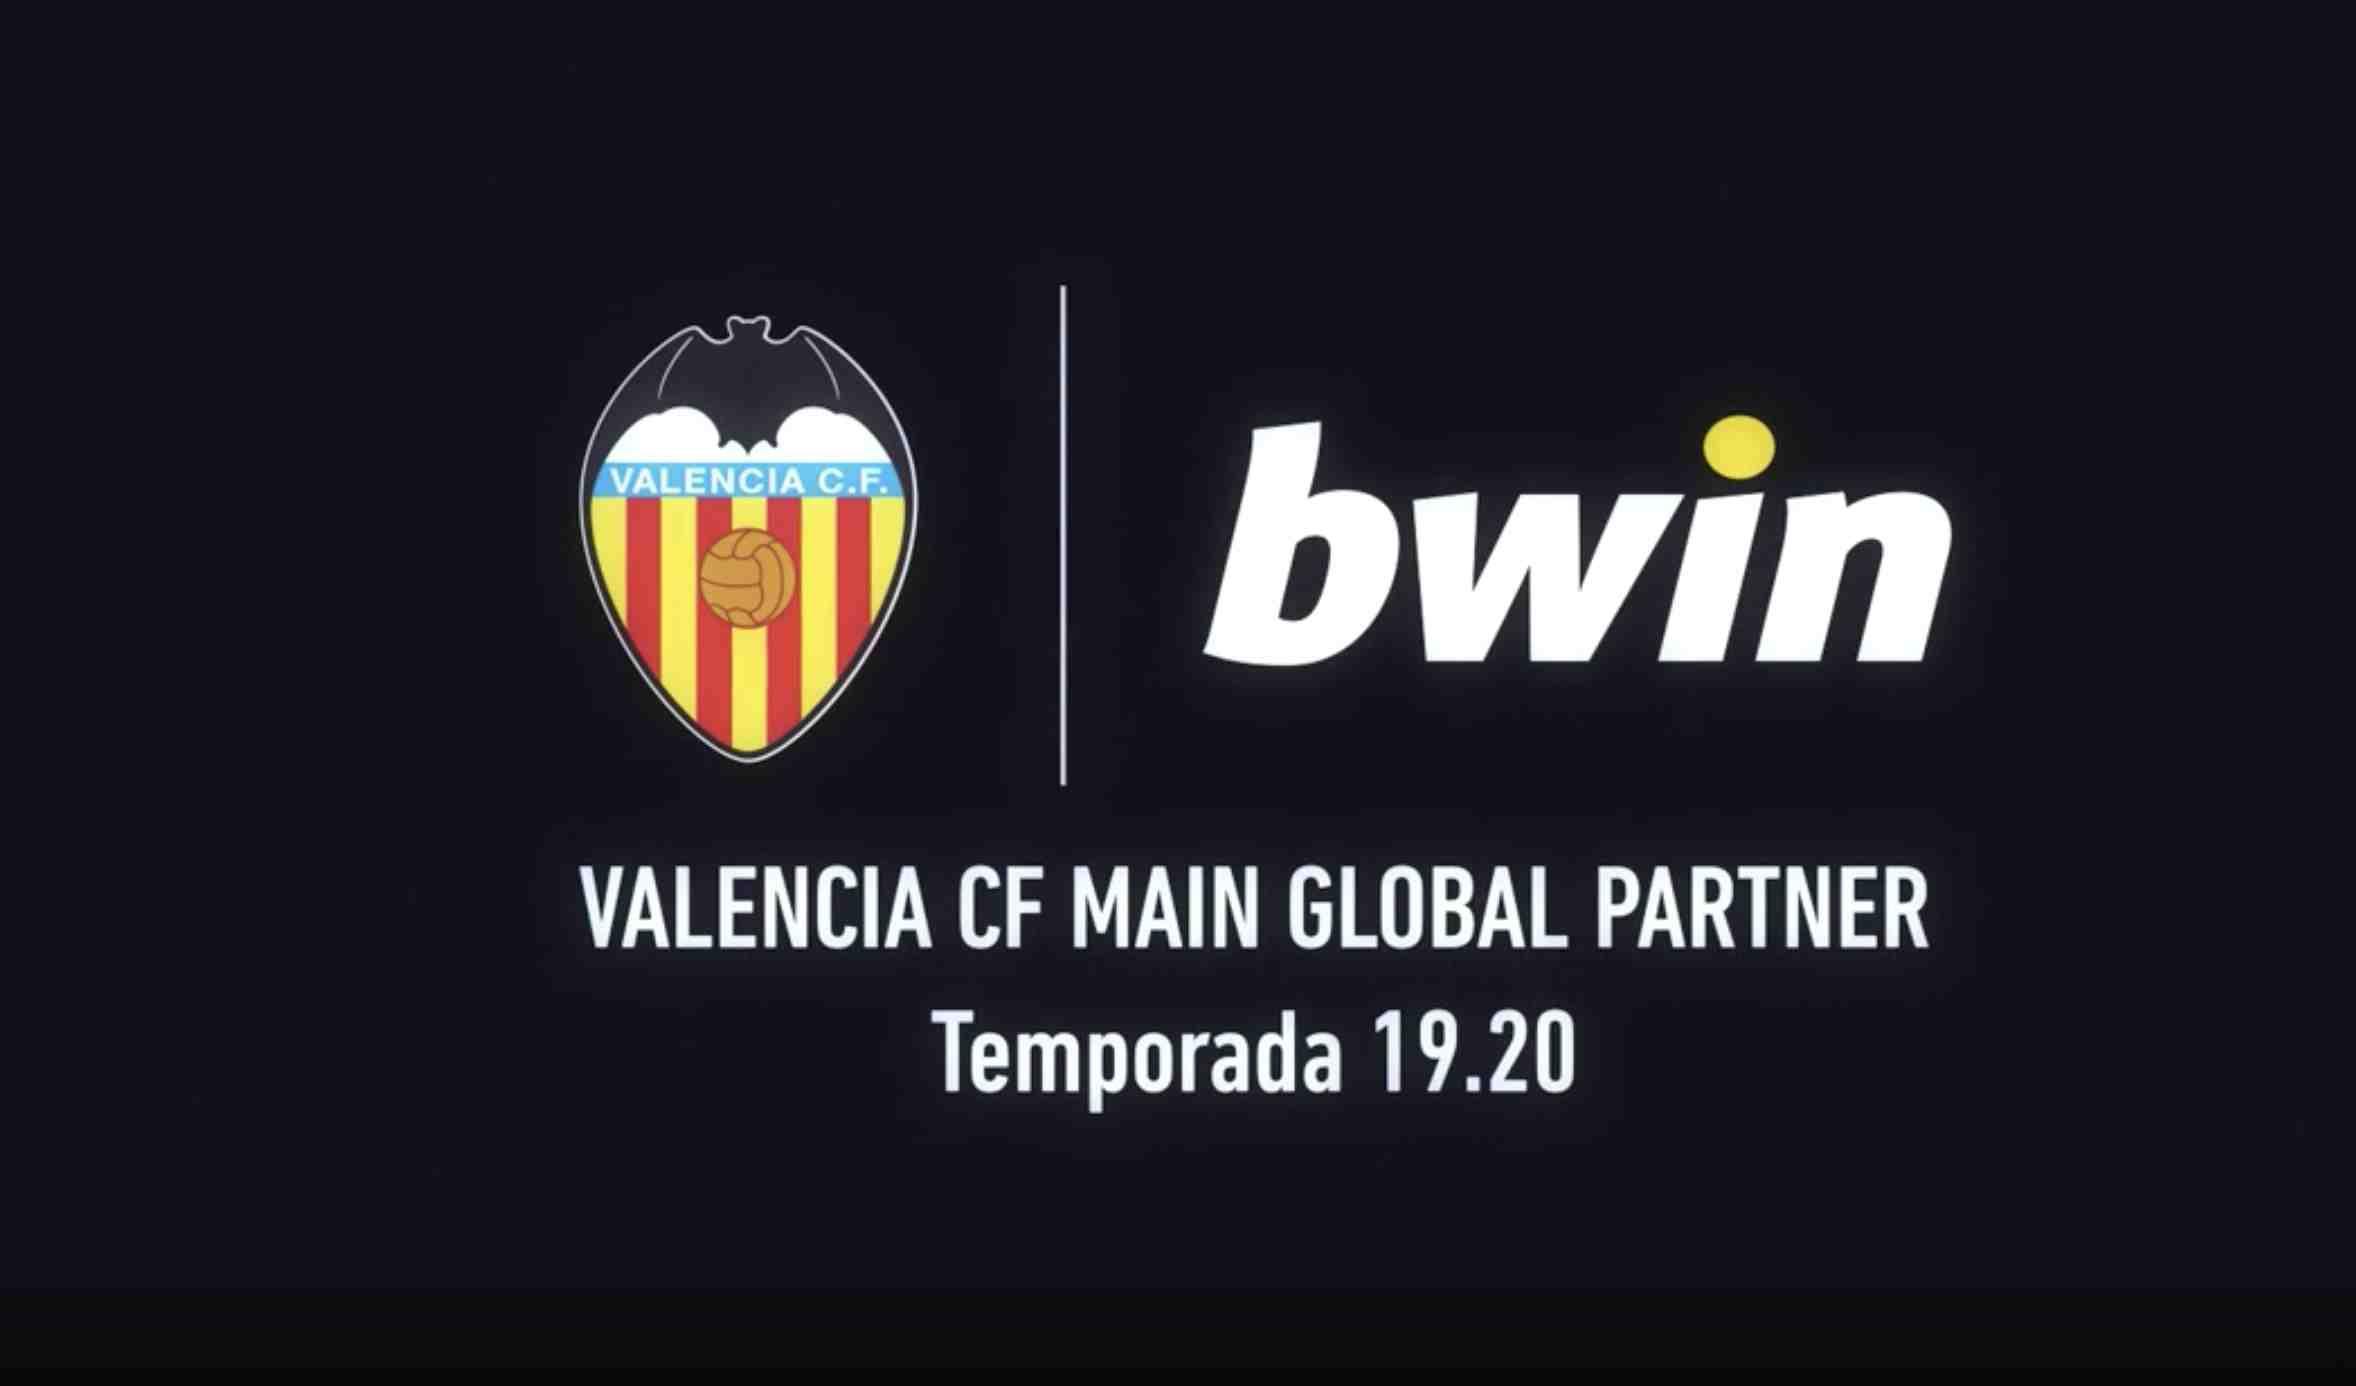 Sports Betting Sponsorship Deals In English Football Championship, Spanish La Liga